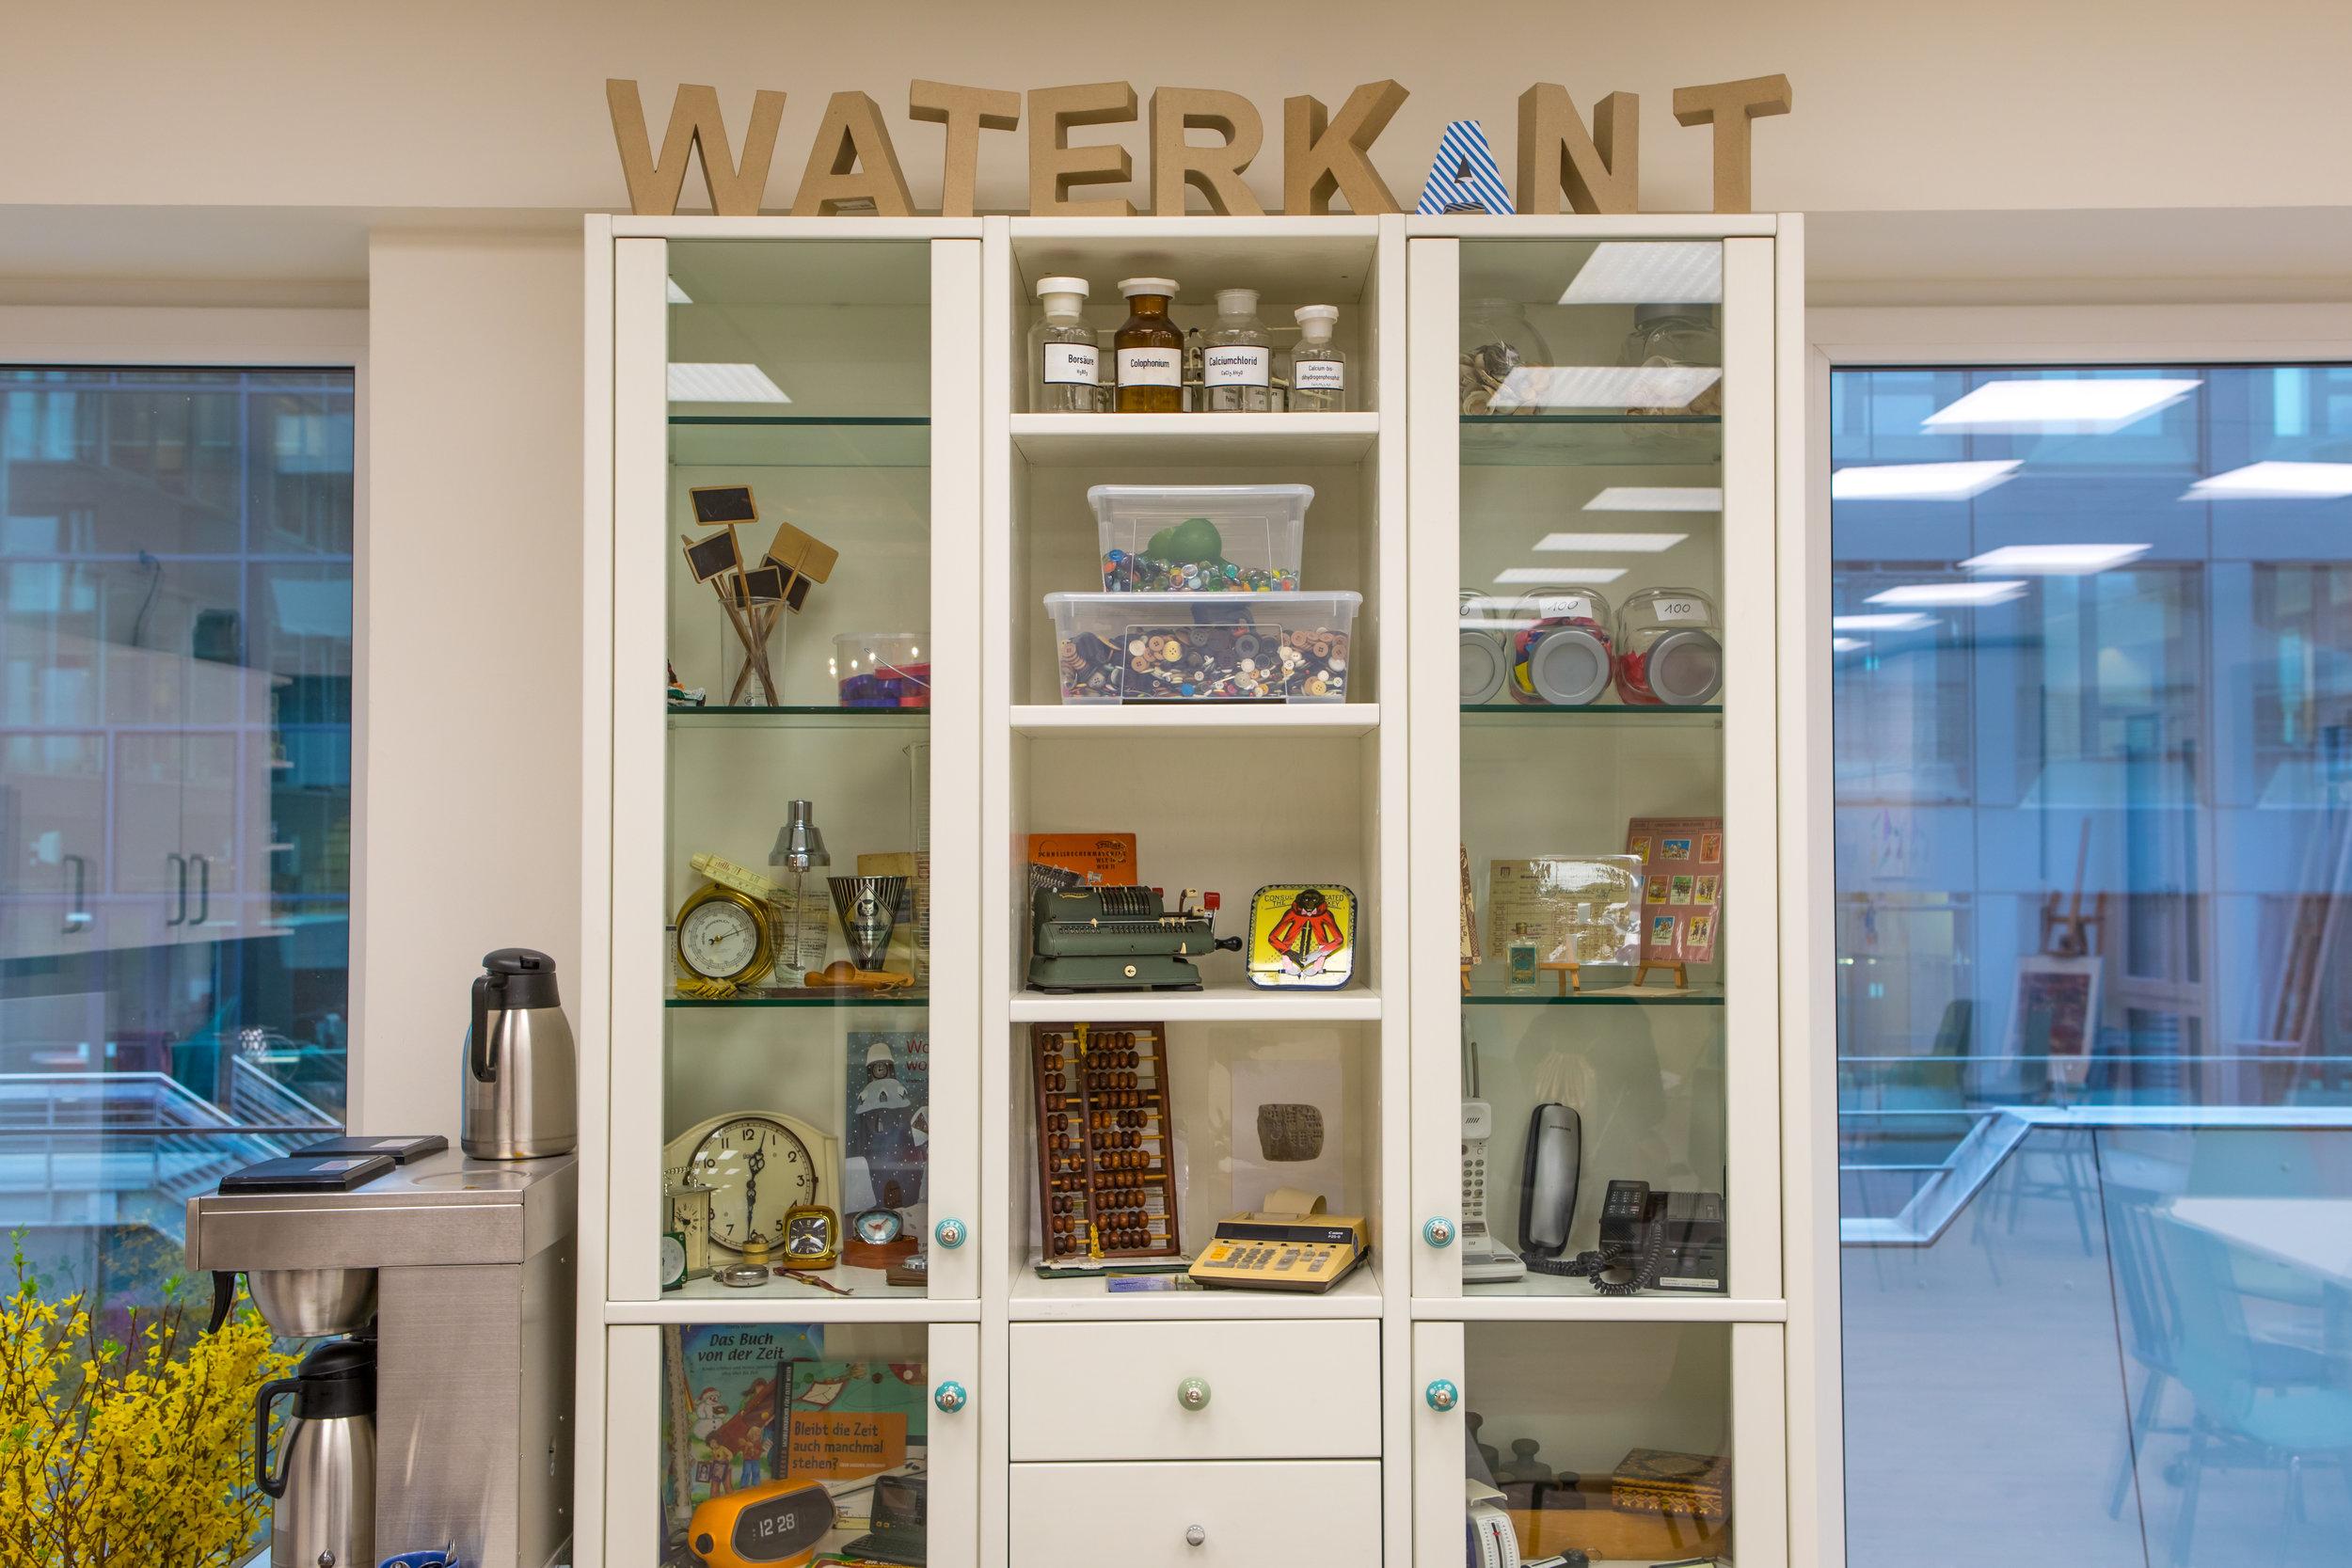 2018-Waterkant-Academy-van-Dieken_002.jpg